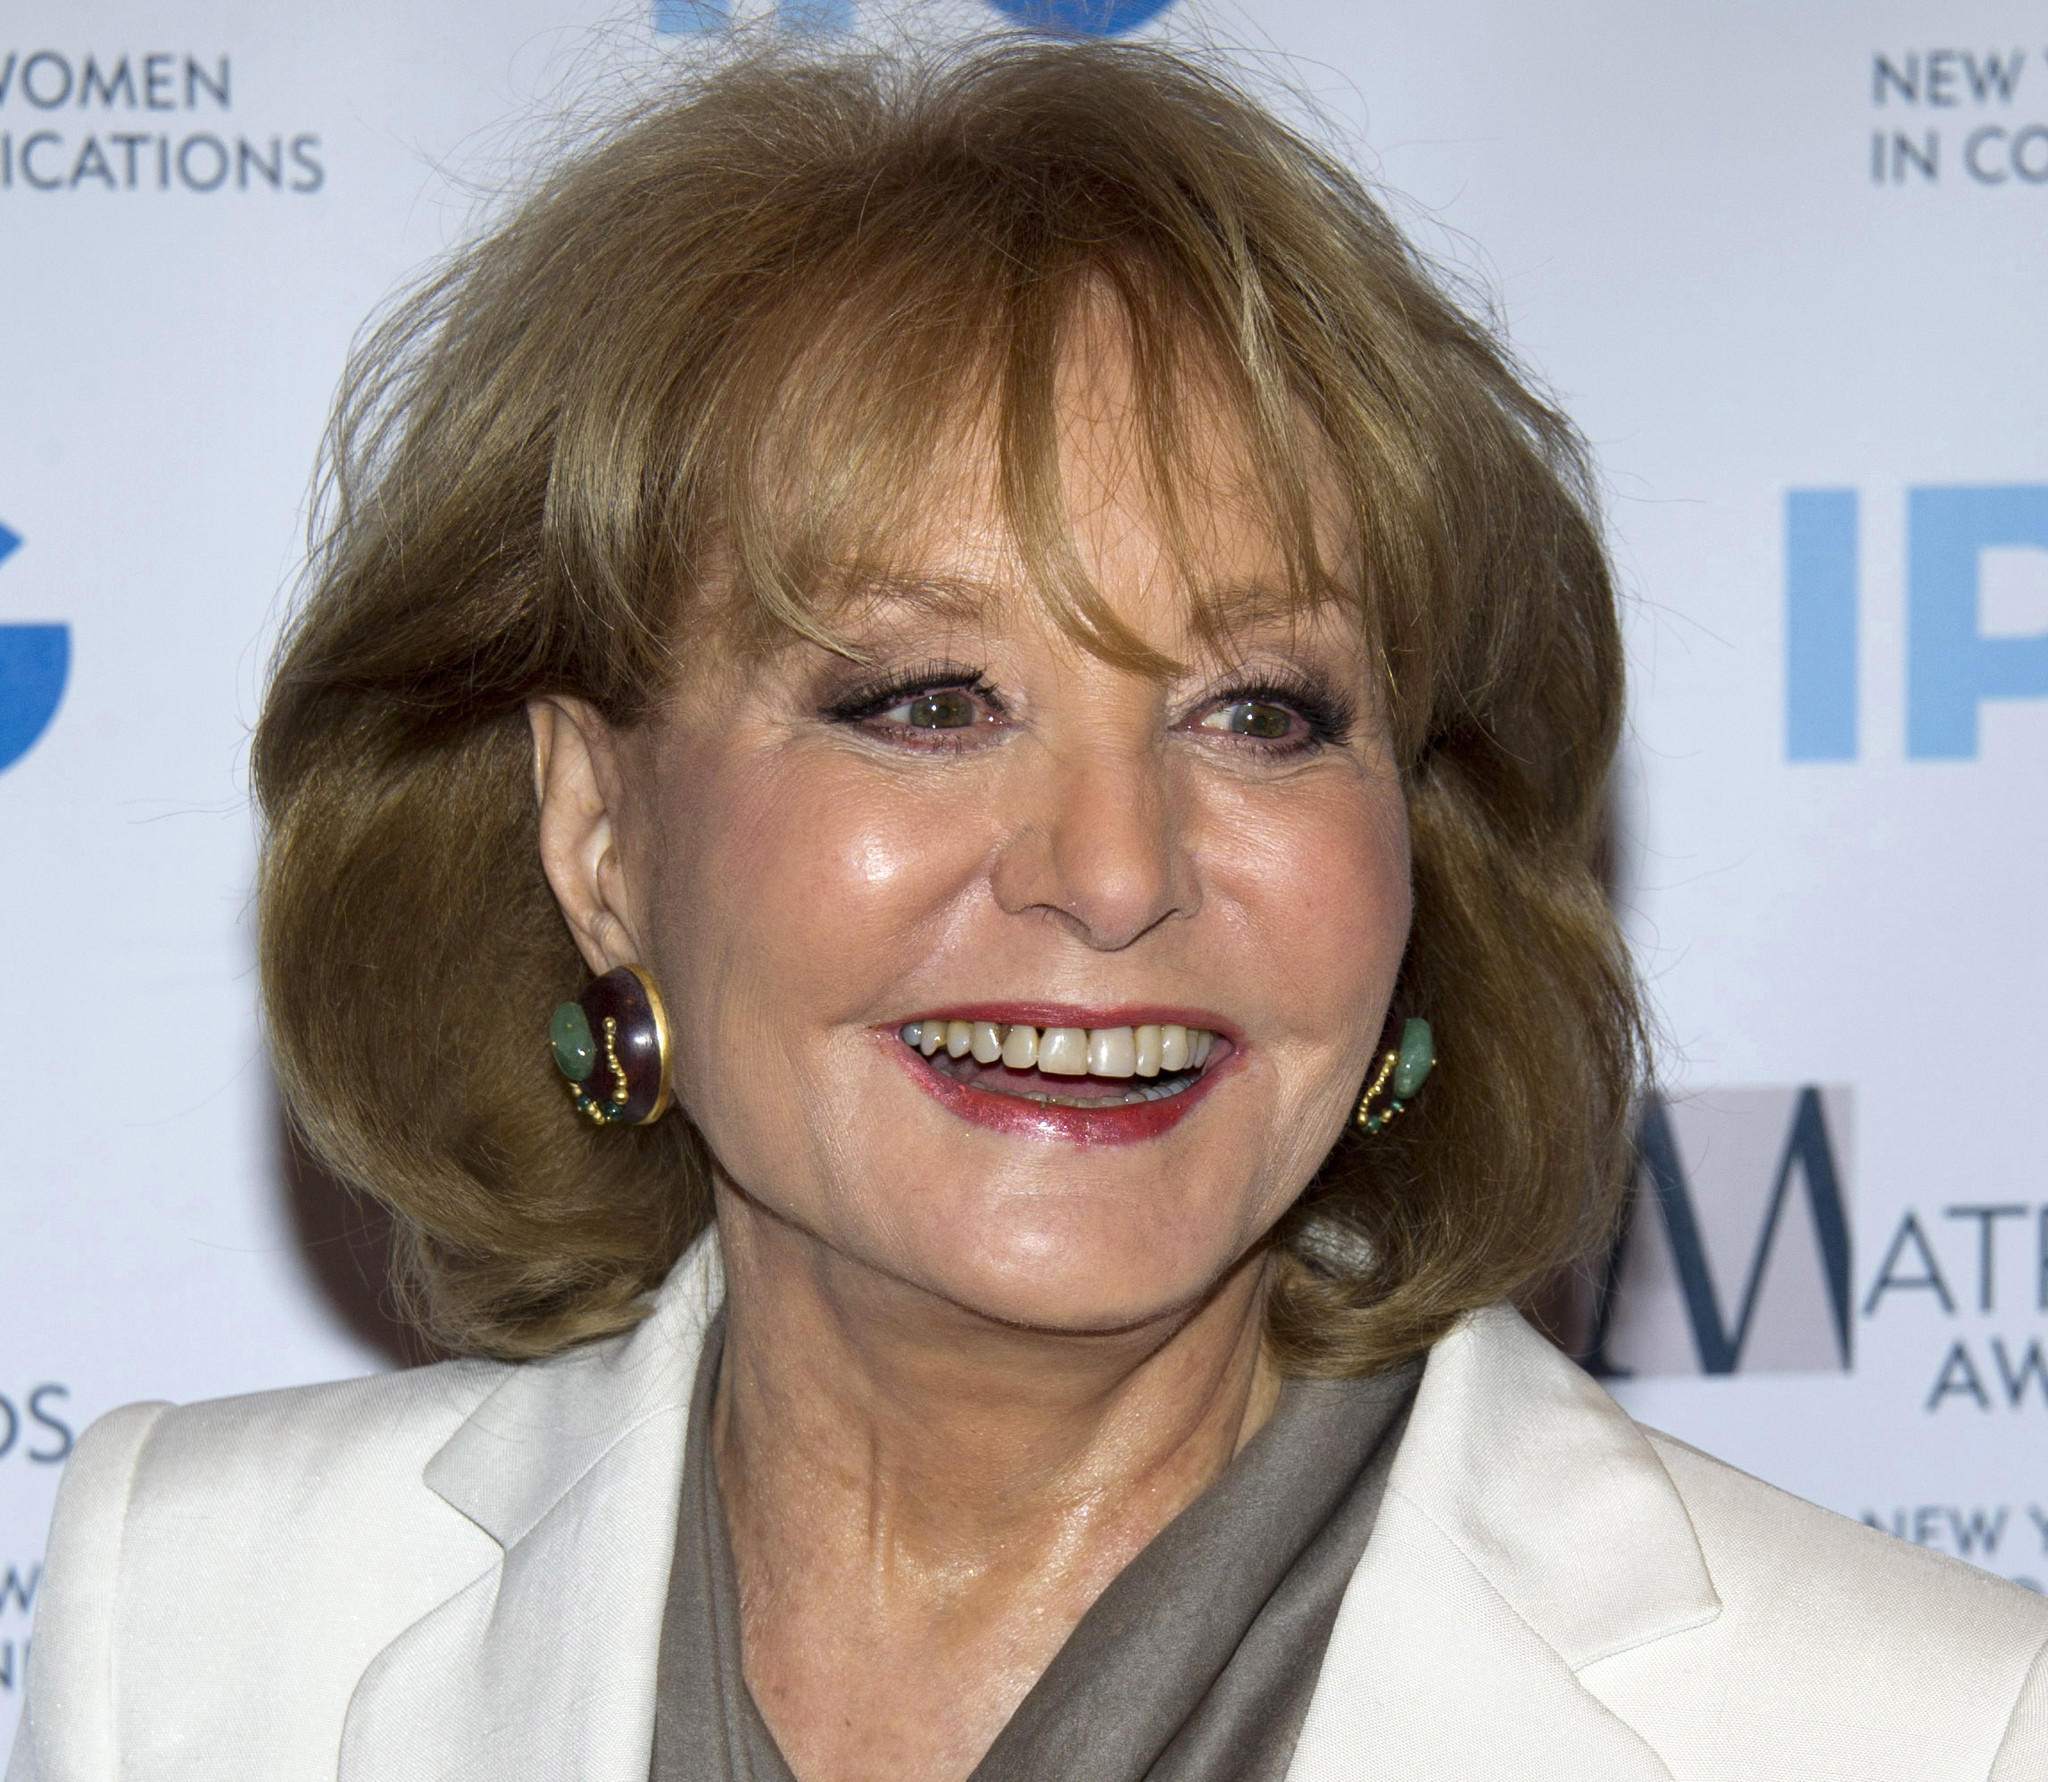 Barbara Walters in a 2012 photo.